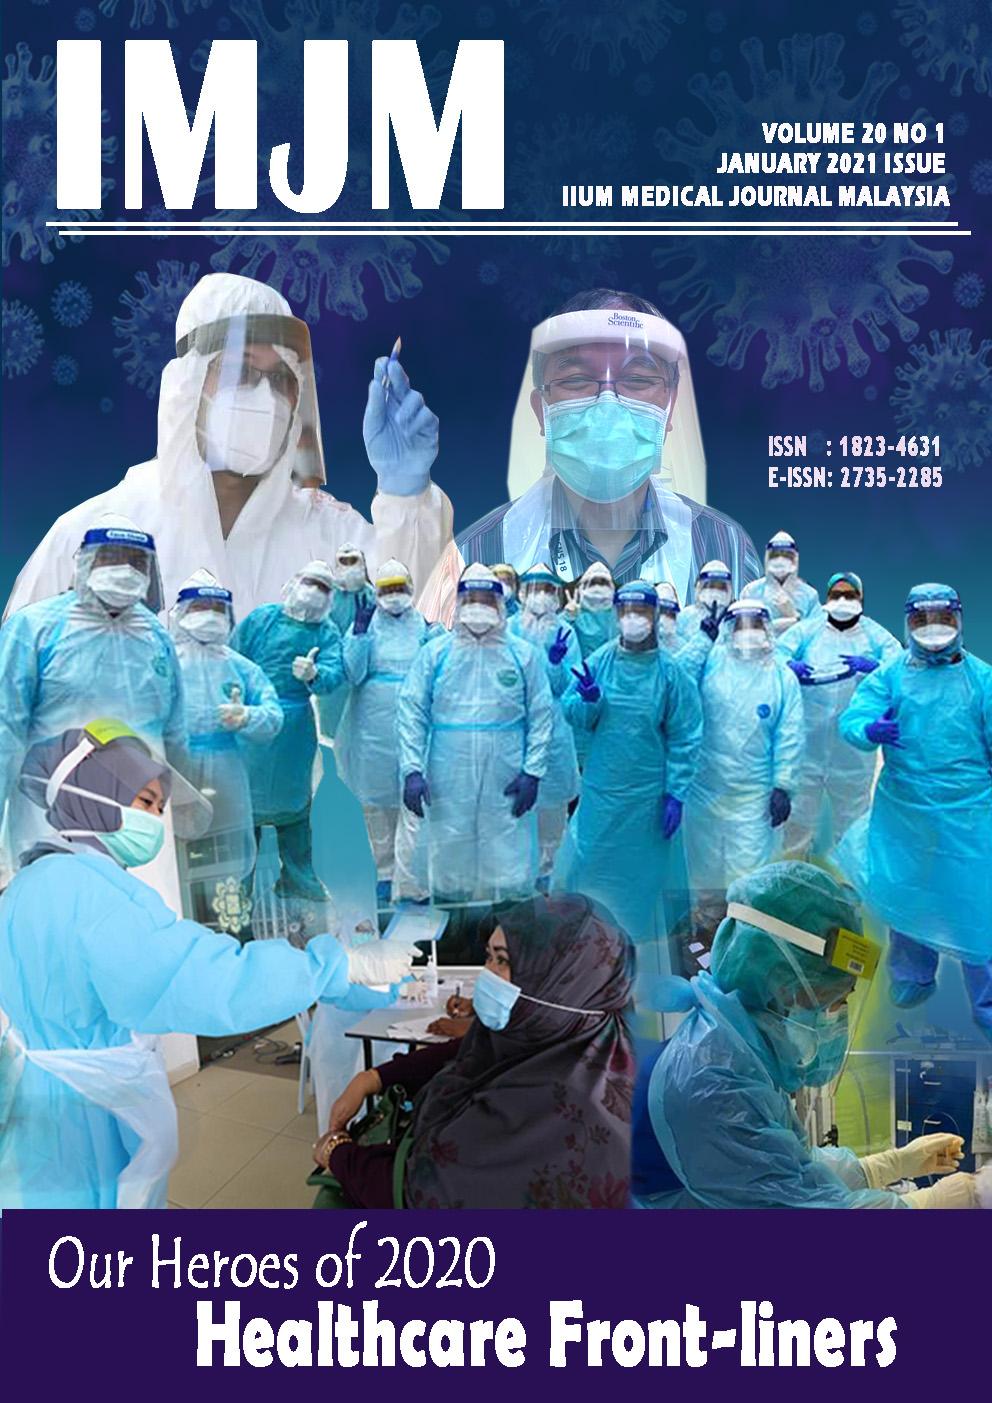 View Vol. 20 No. 1 (2021): IIUM Medical Journal Malaysia - January 2021